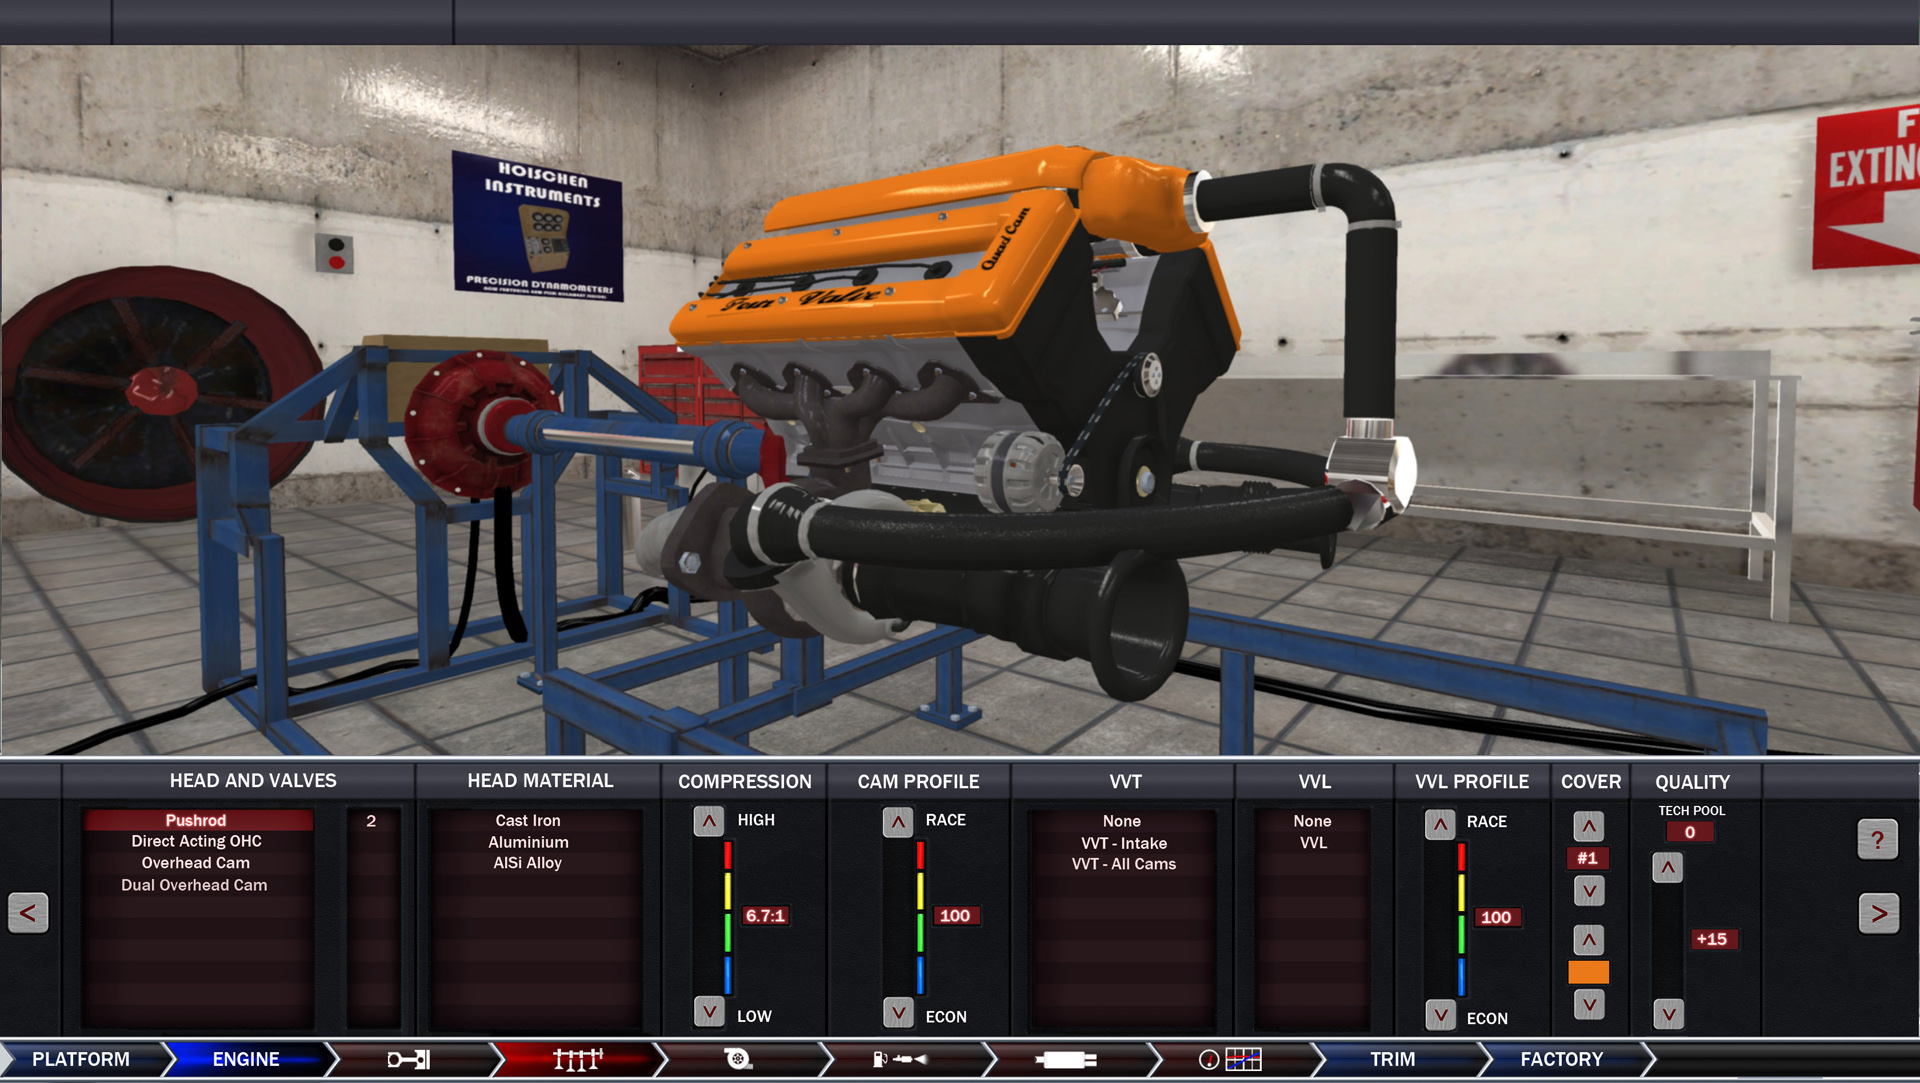 New UI Reskin Mockup image - Automation: The Car Company ...